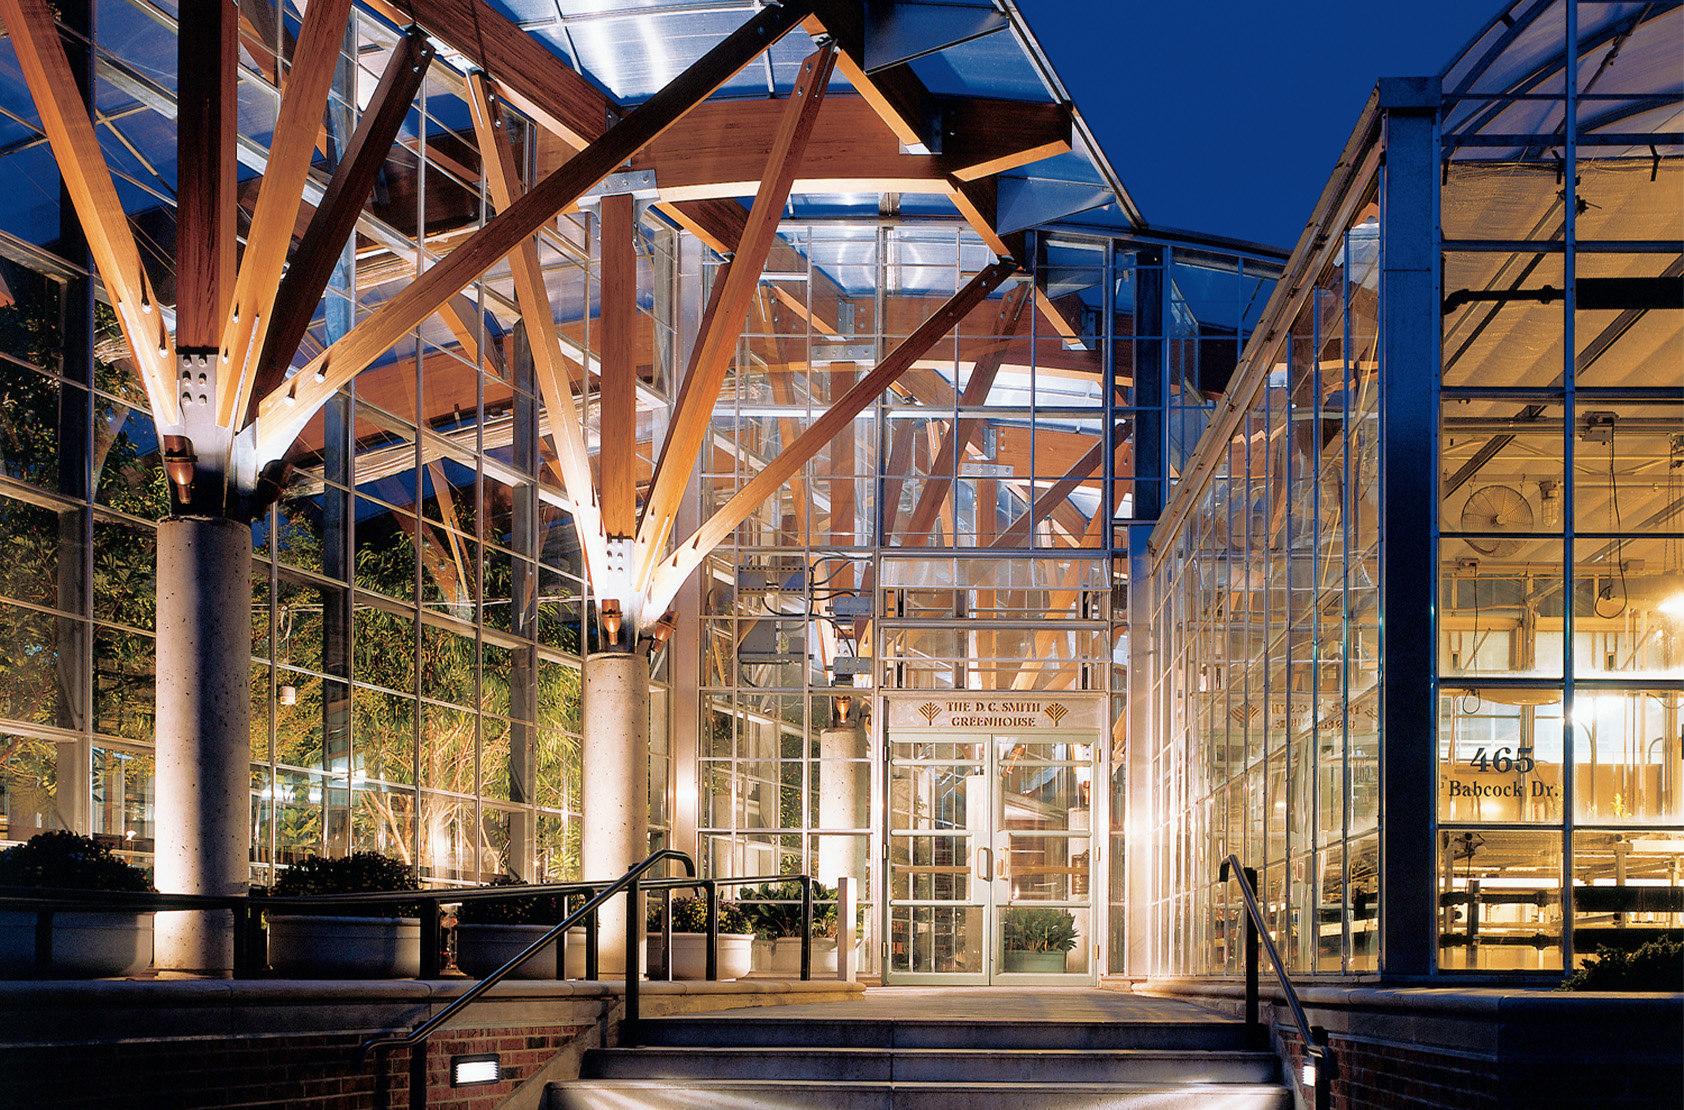 University of Wisconsin, Madison - D.C. Smith Greenhouses